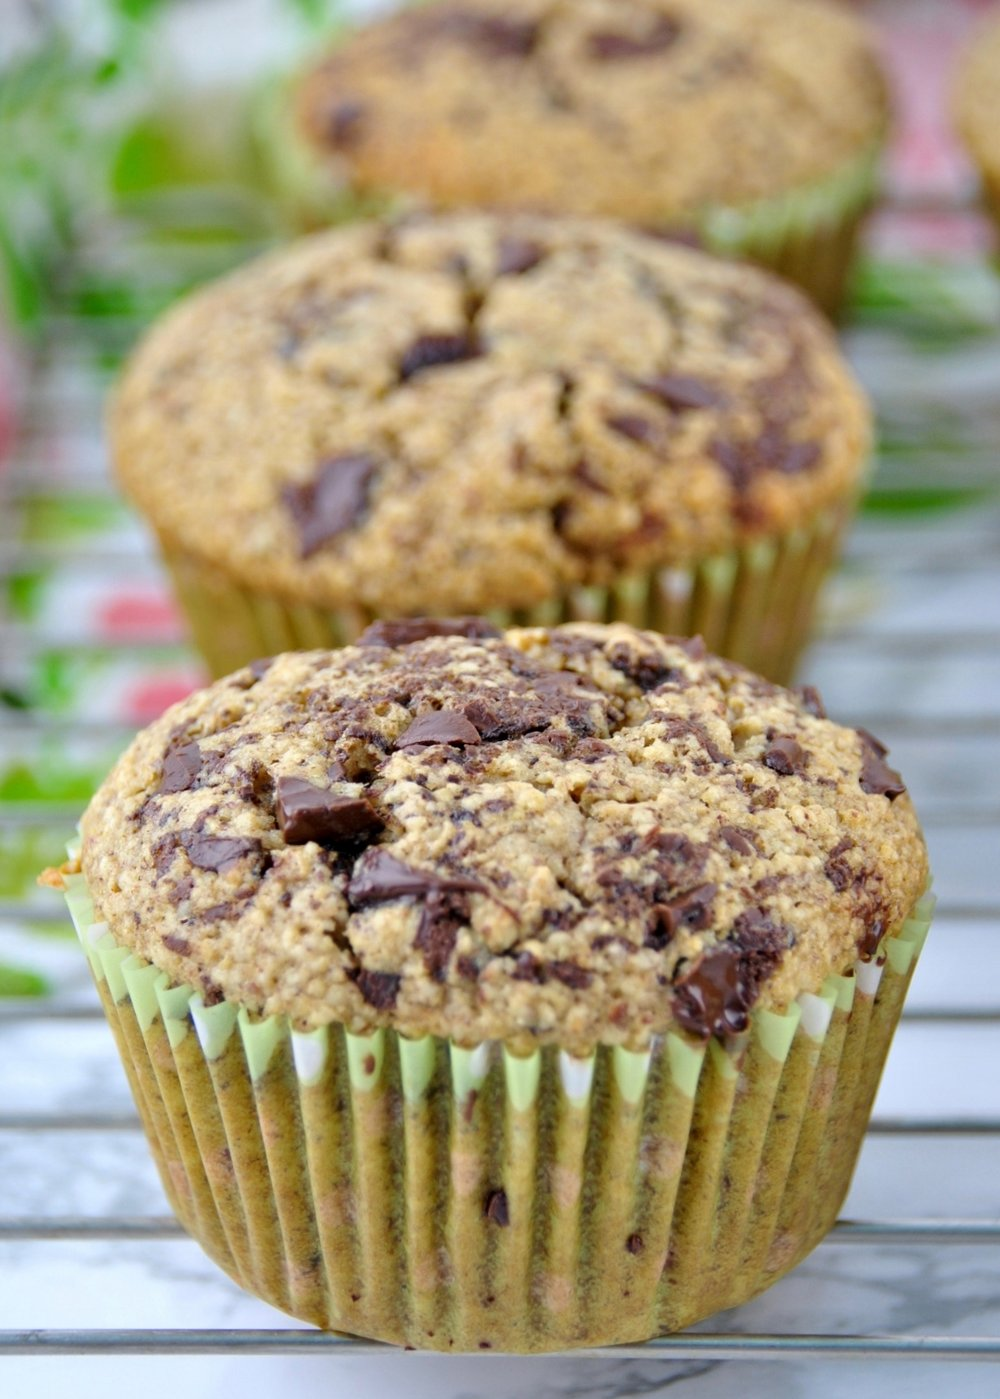 Oat & Almond Muffins